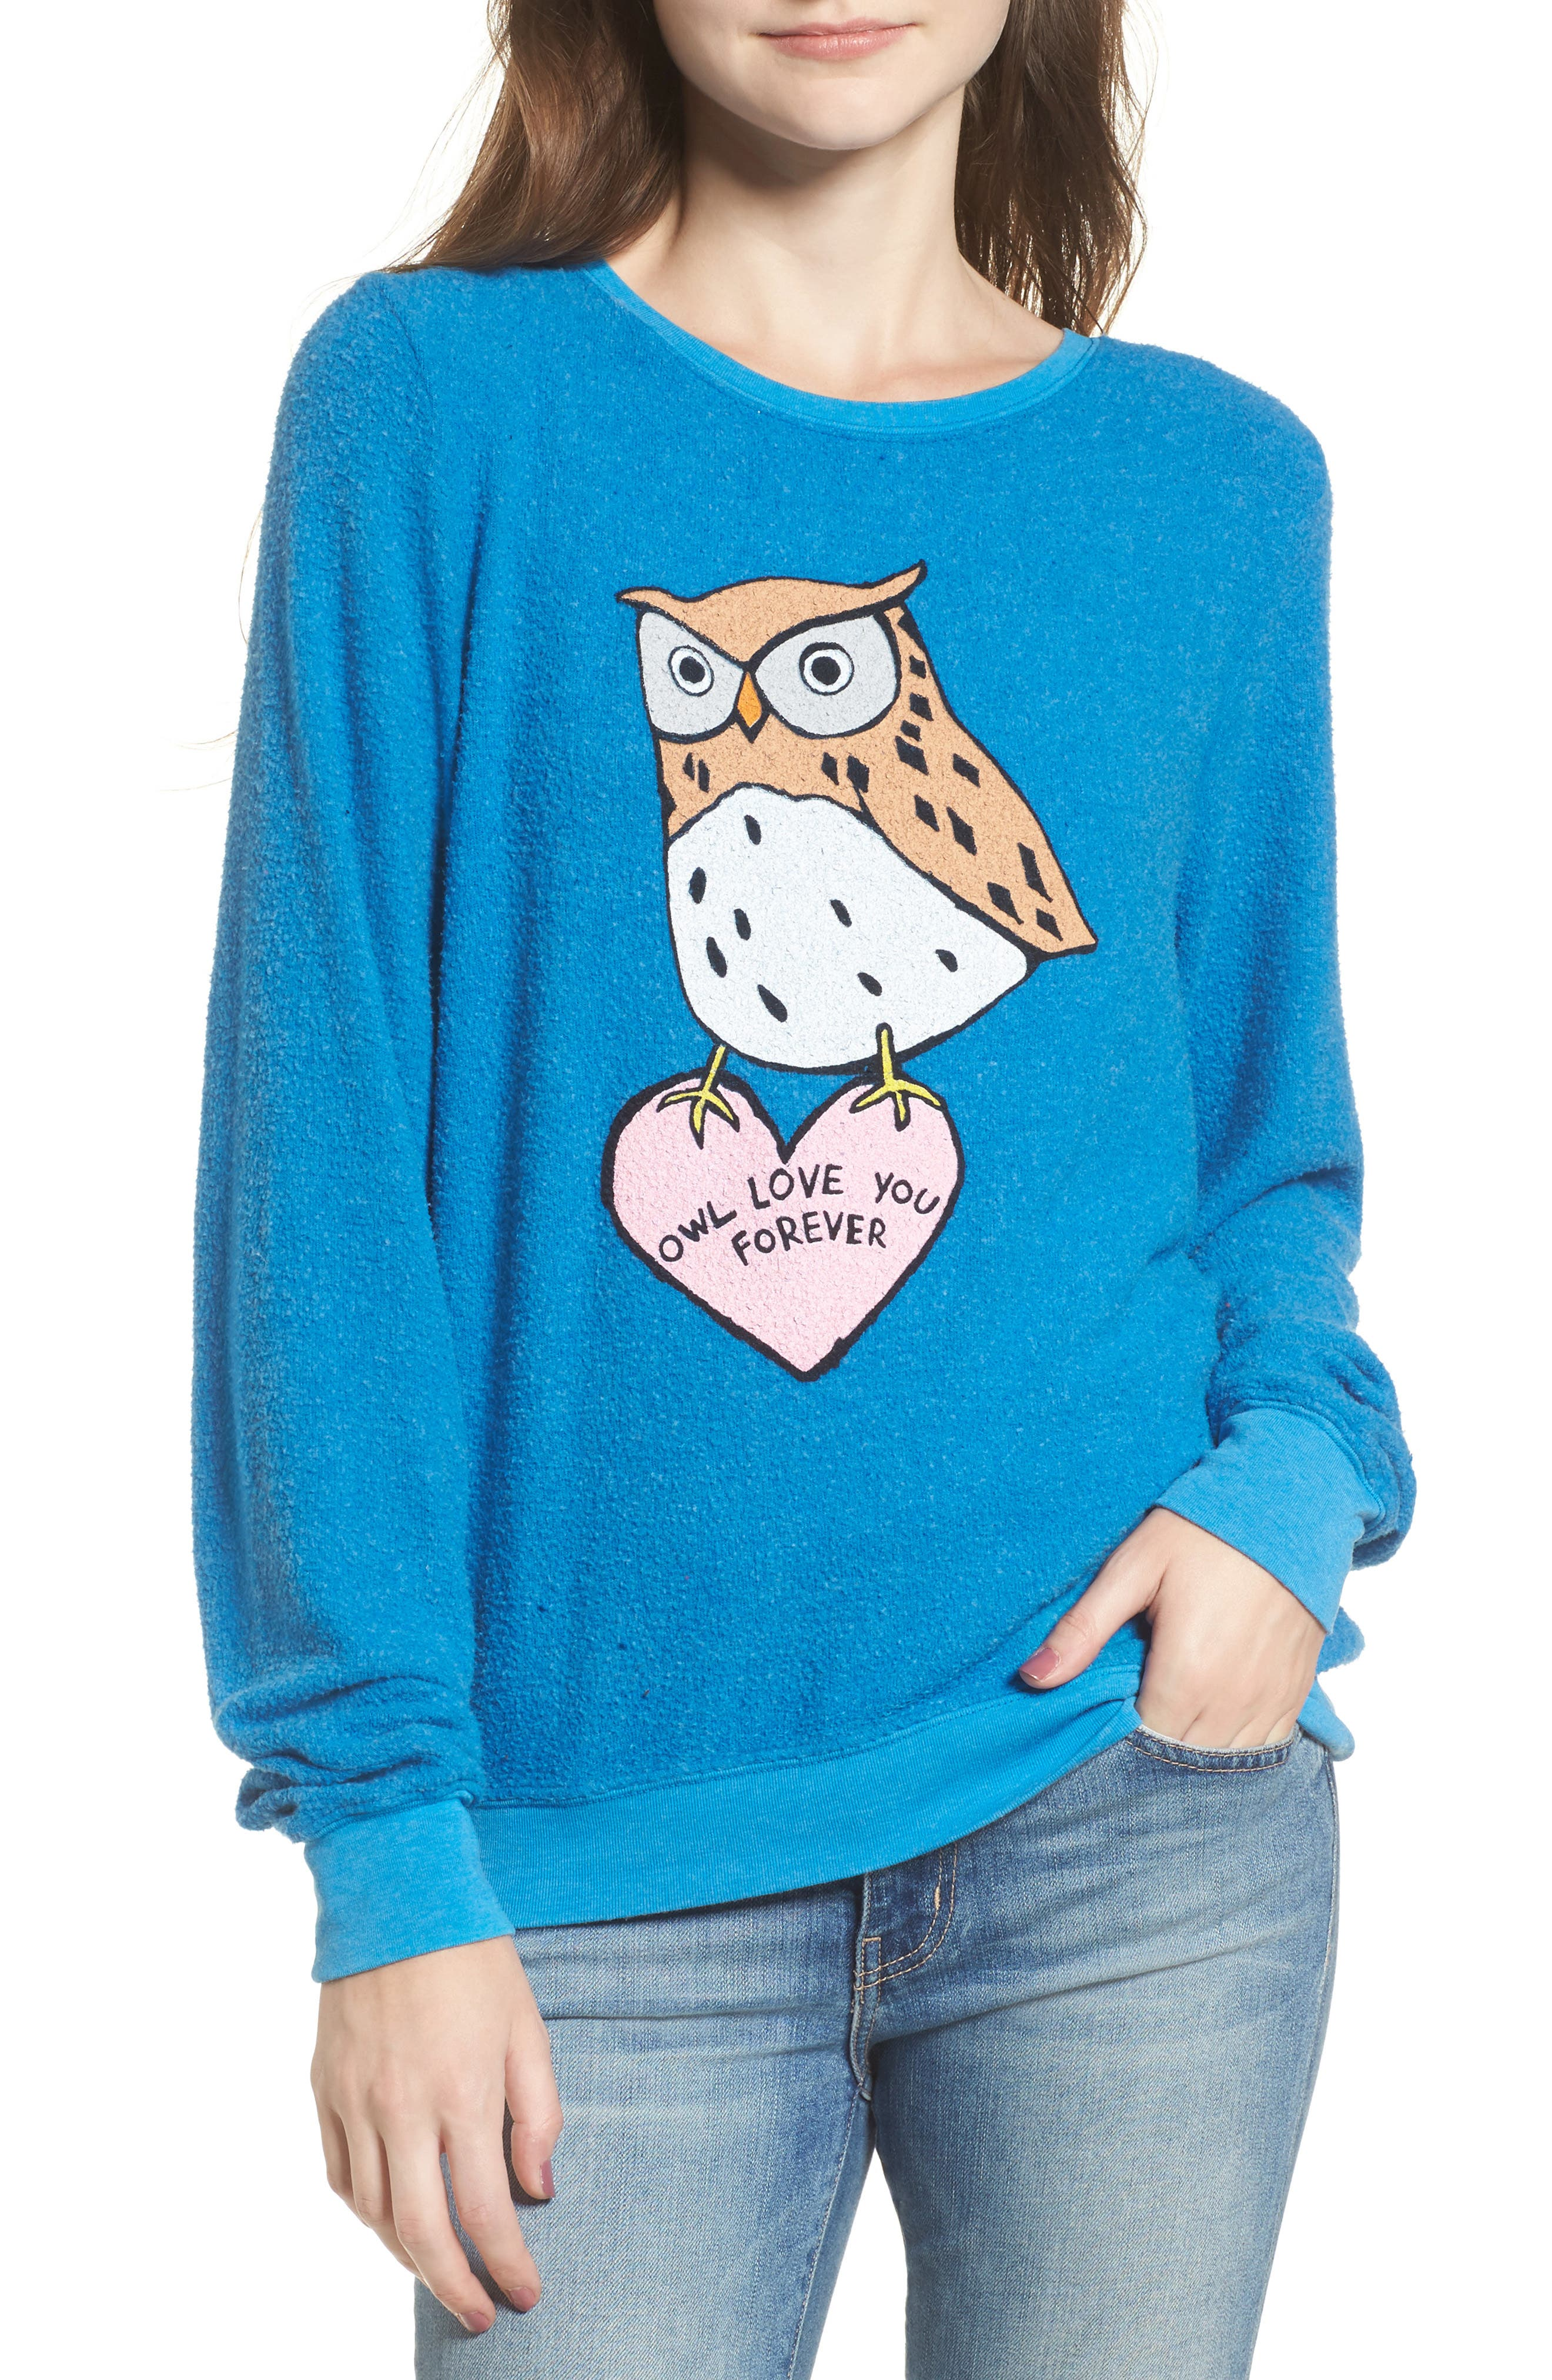 Owl Love You Forever Sweatshirt,                             Main thumbnail 1, color,                             401